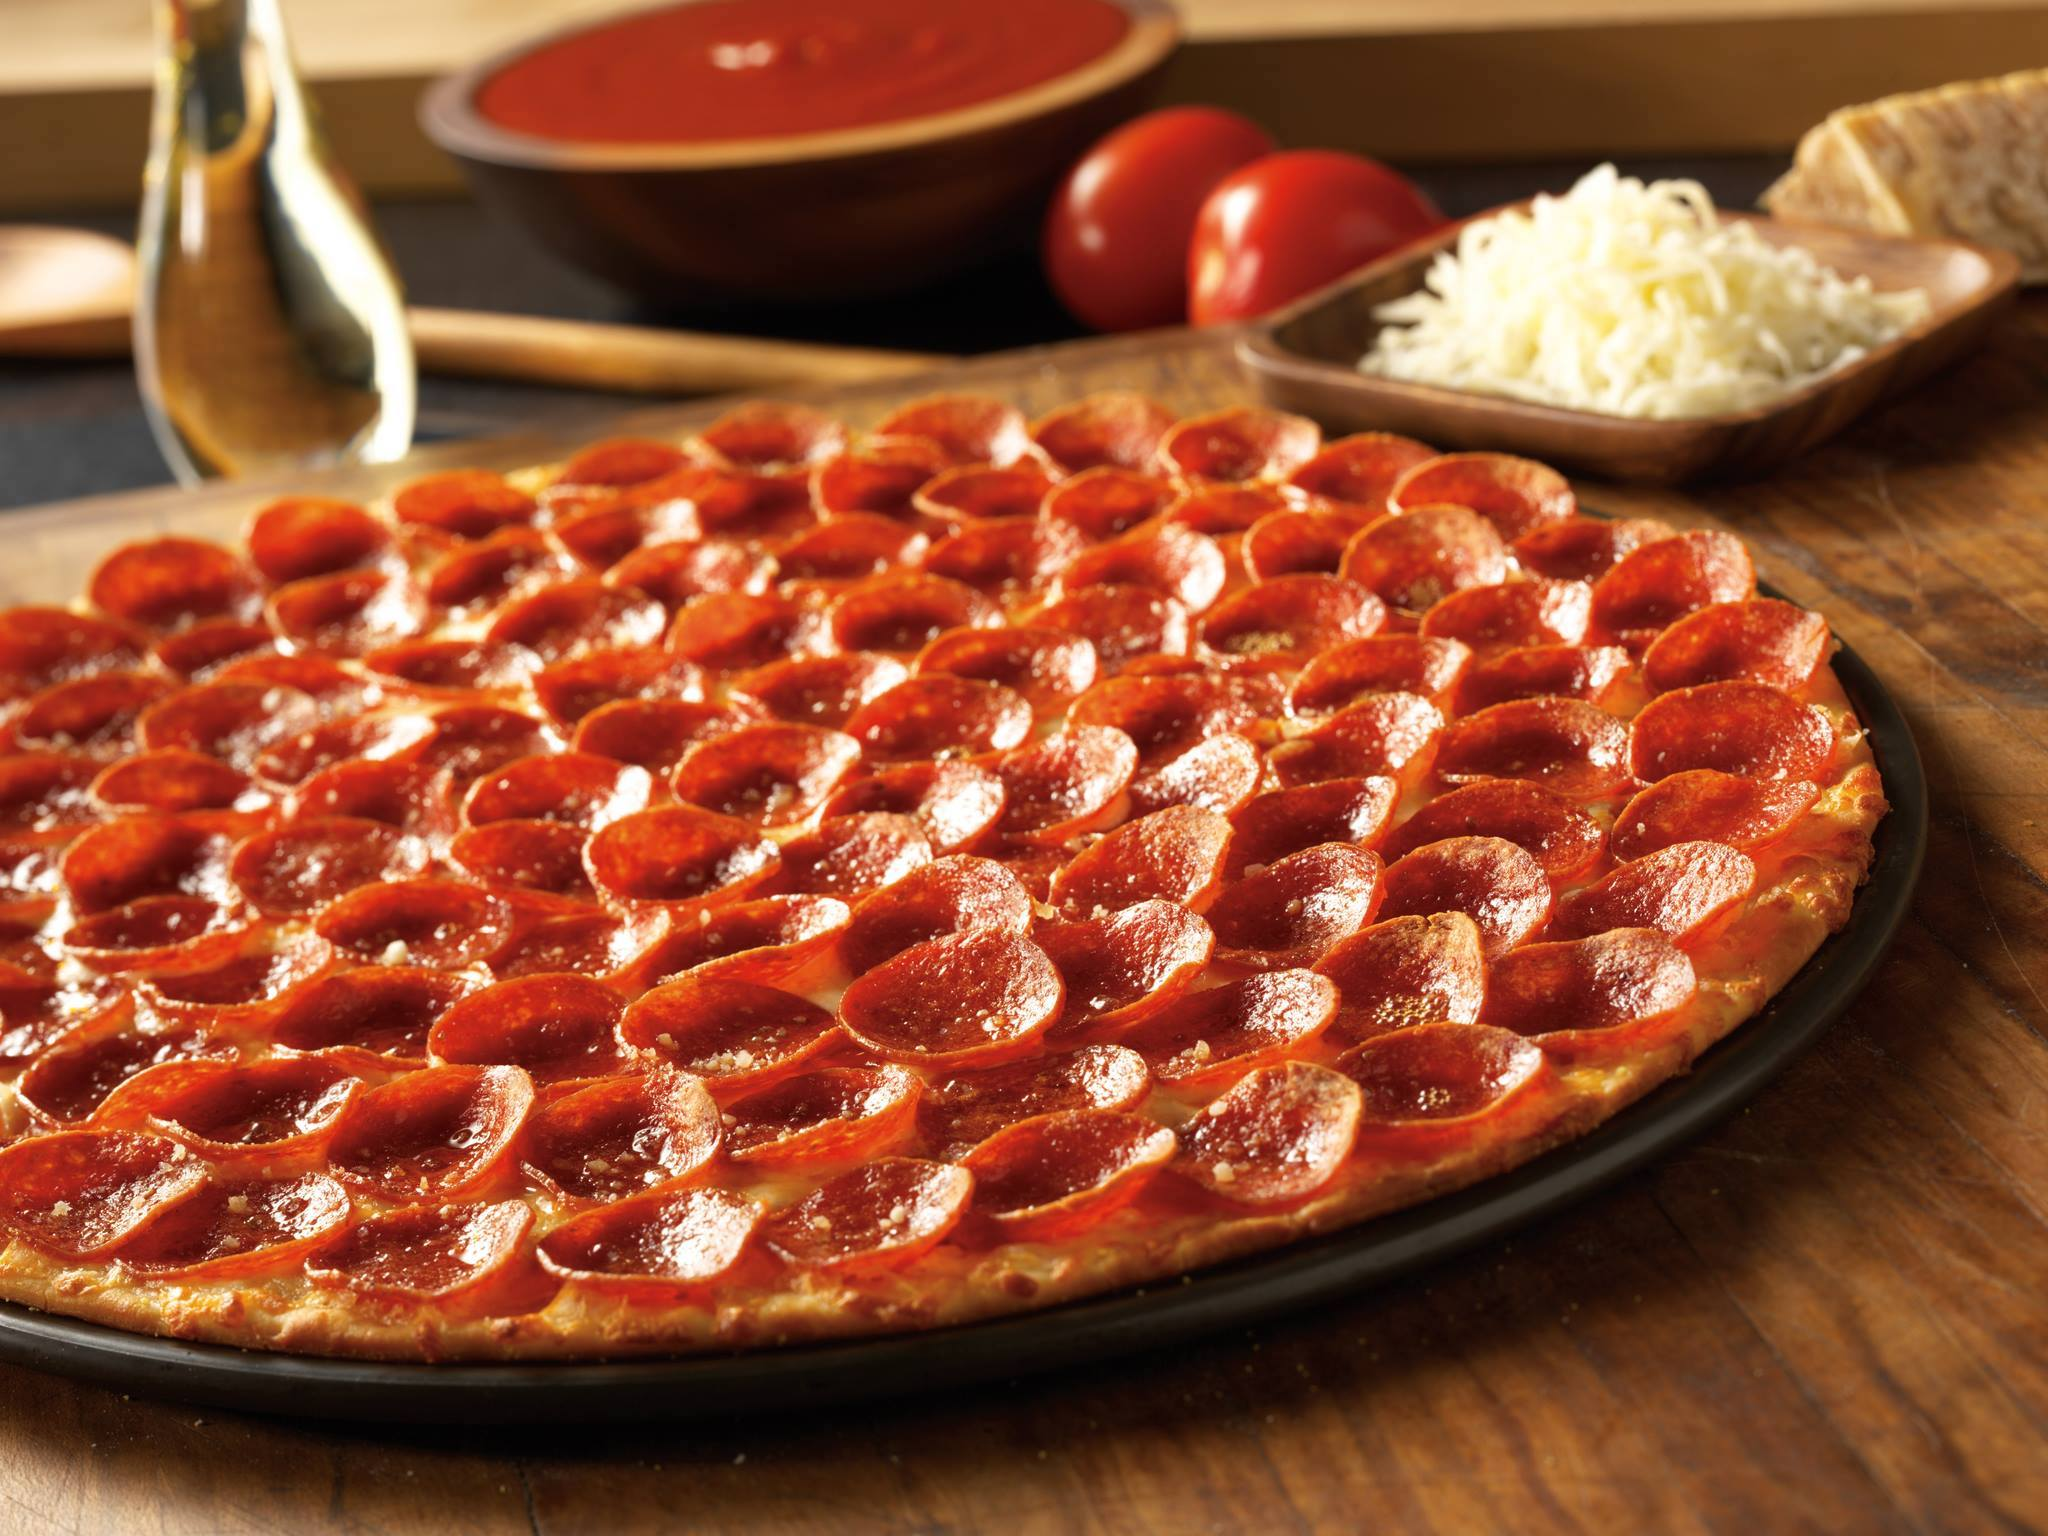 20+ Donatos Gluten Free Pizza Ingredients Images